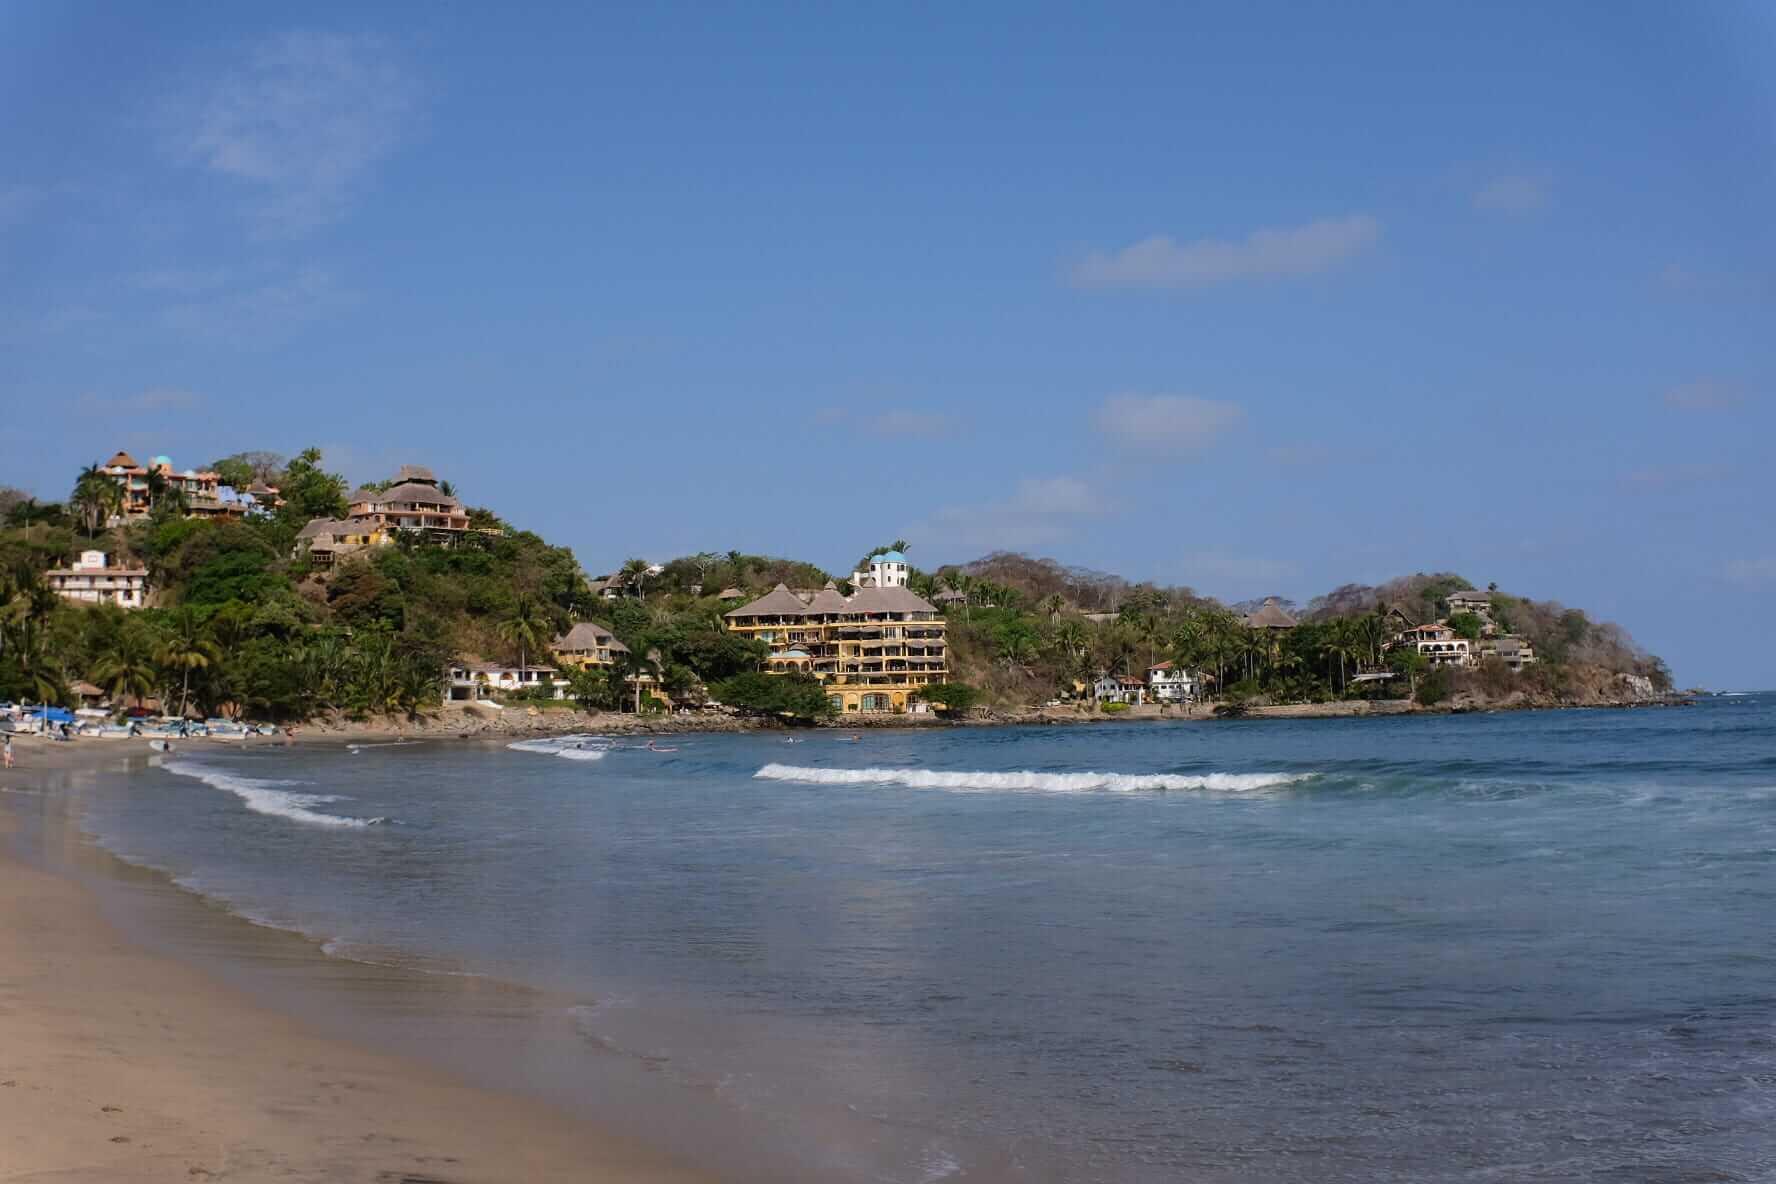 Sandy beach in Mexico